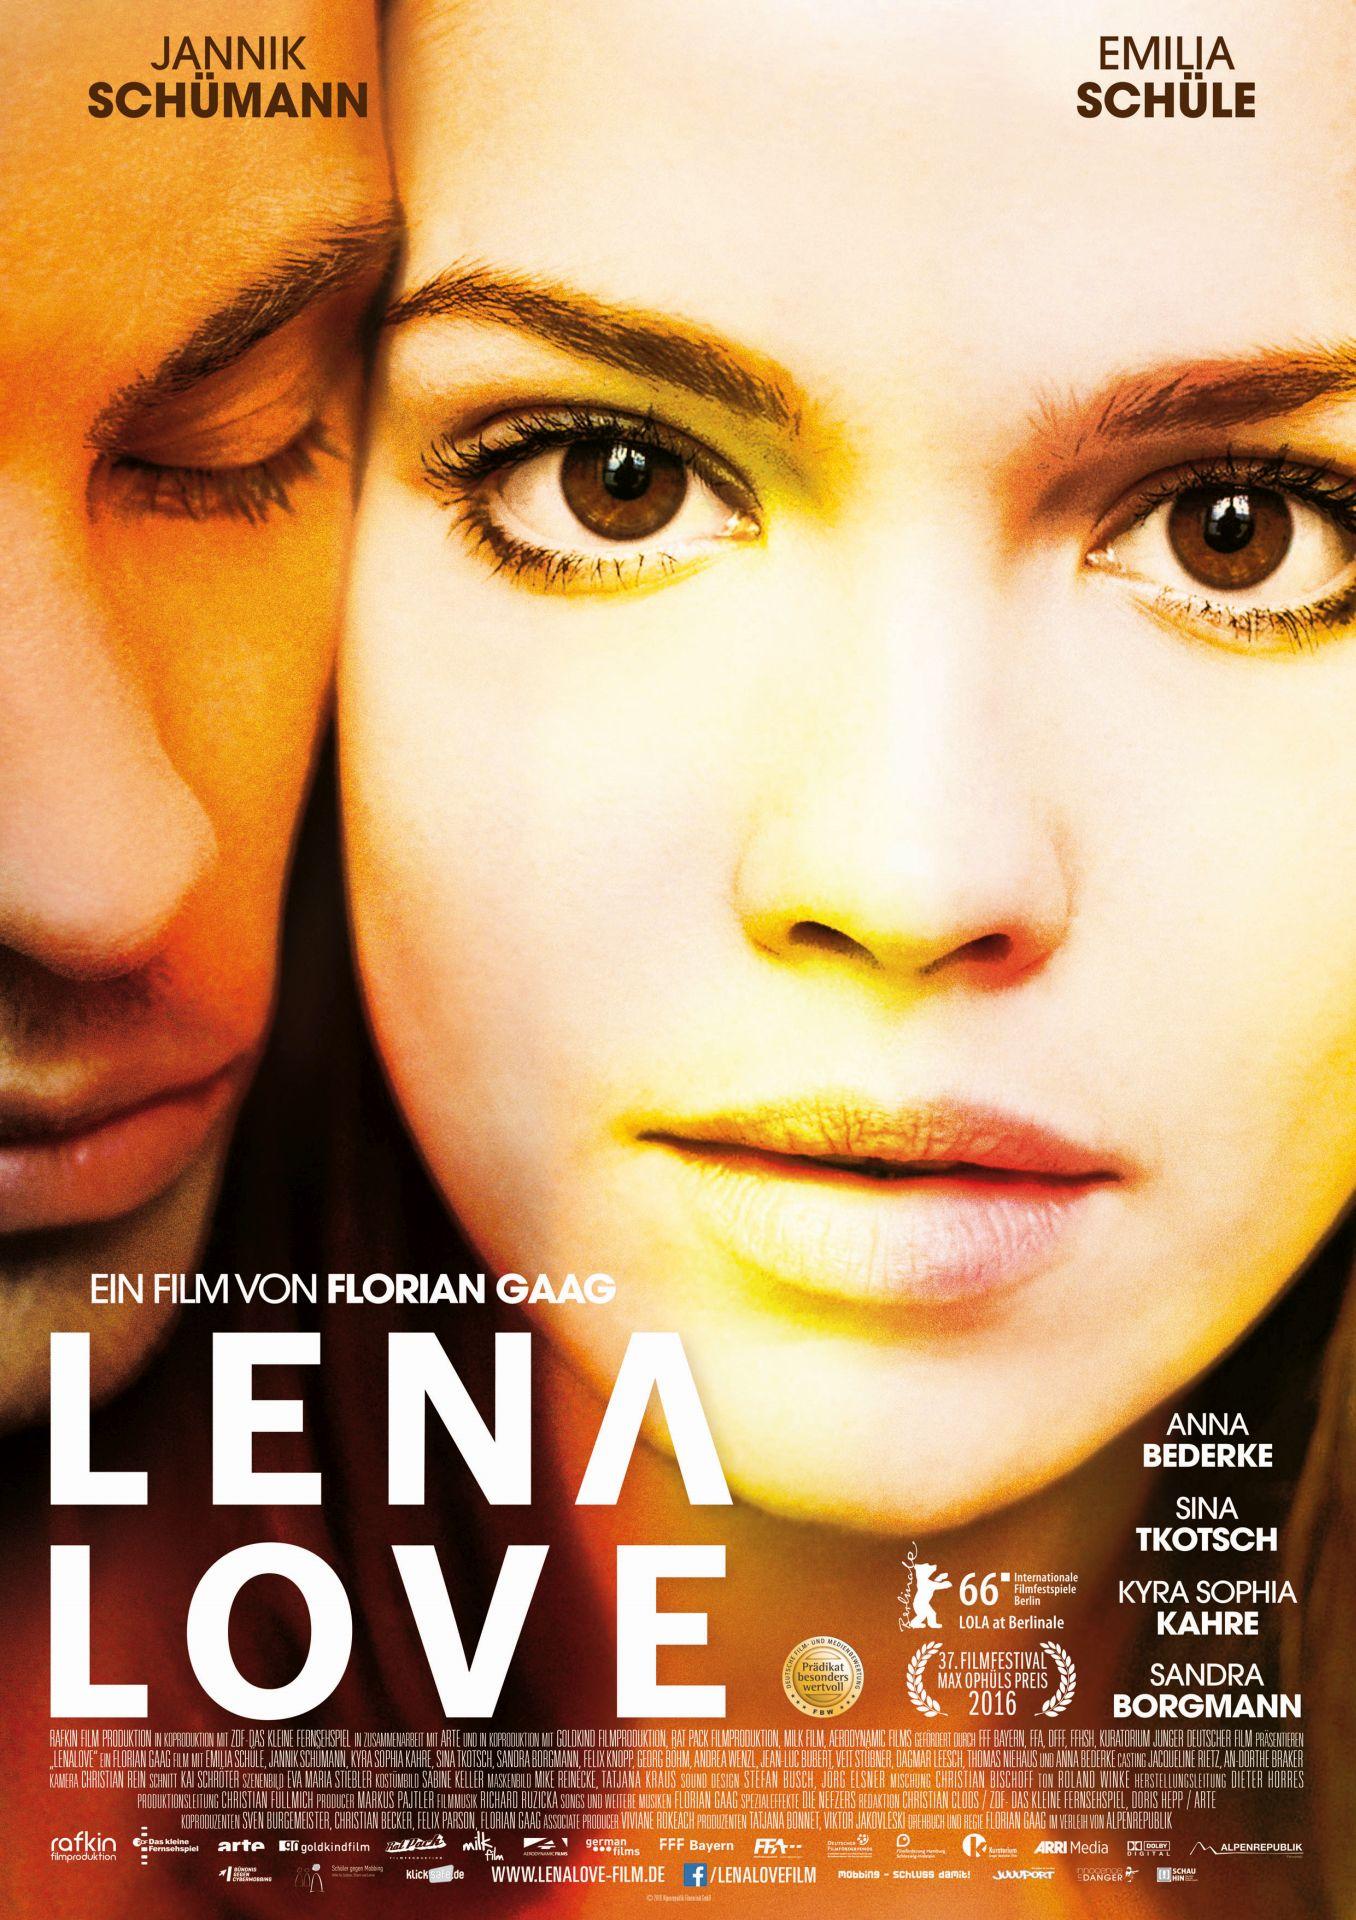 Lena Love Film Trailer